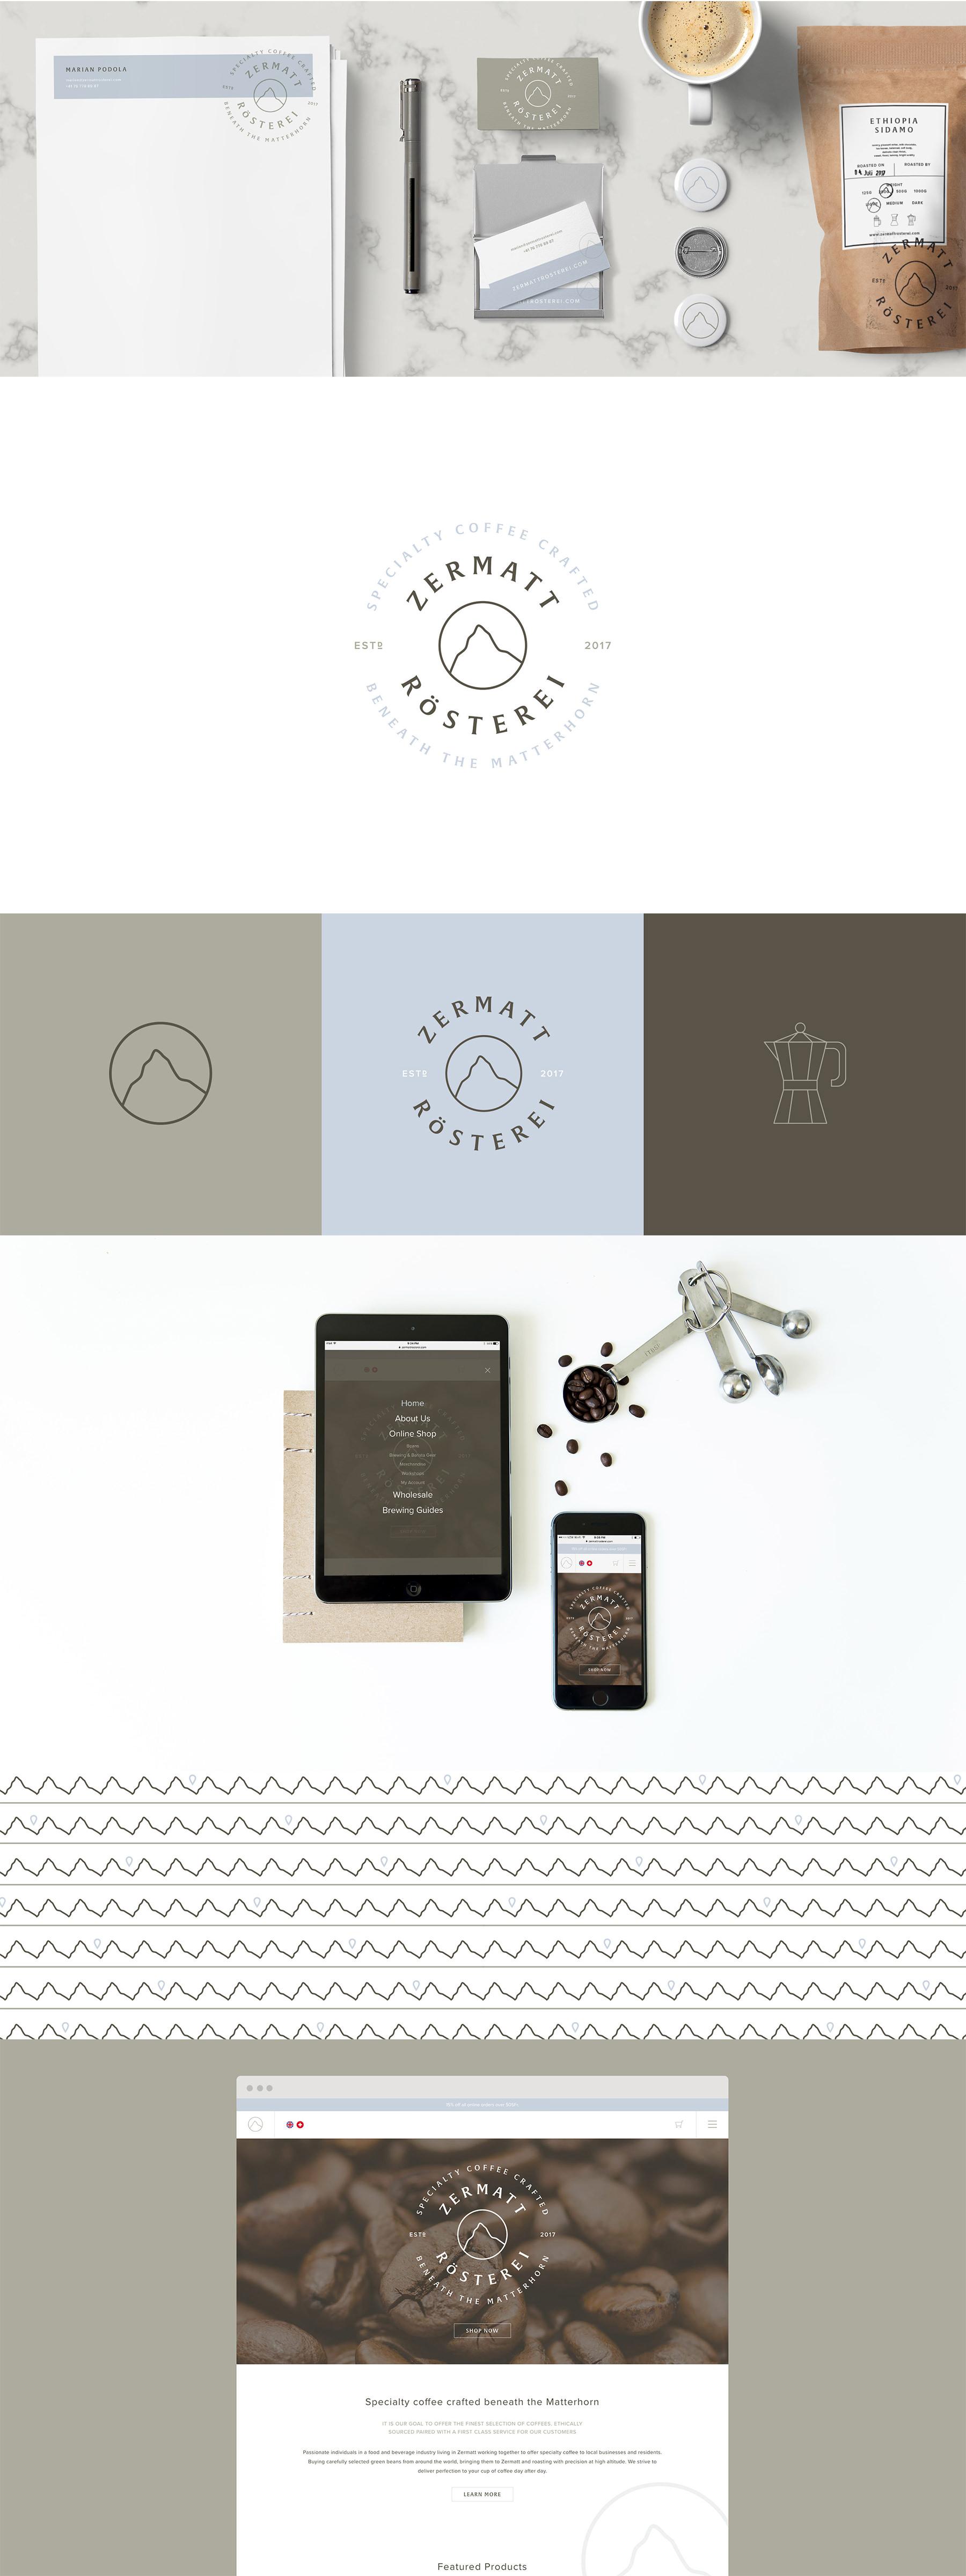 Zermatt Rösterei branding by The Curio Collective